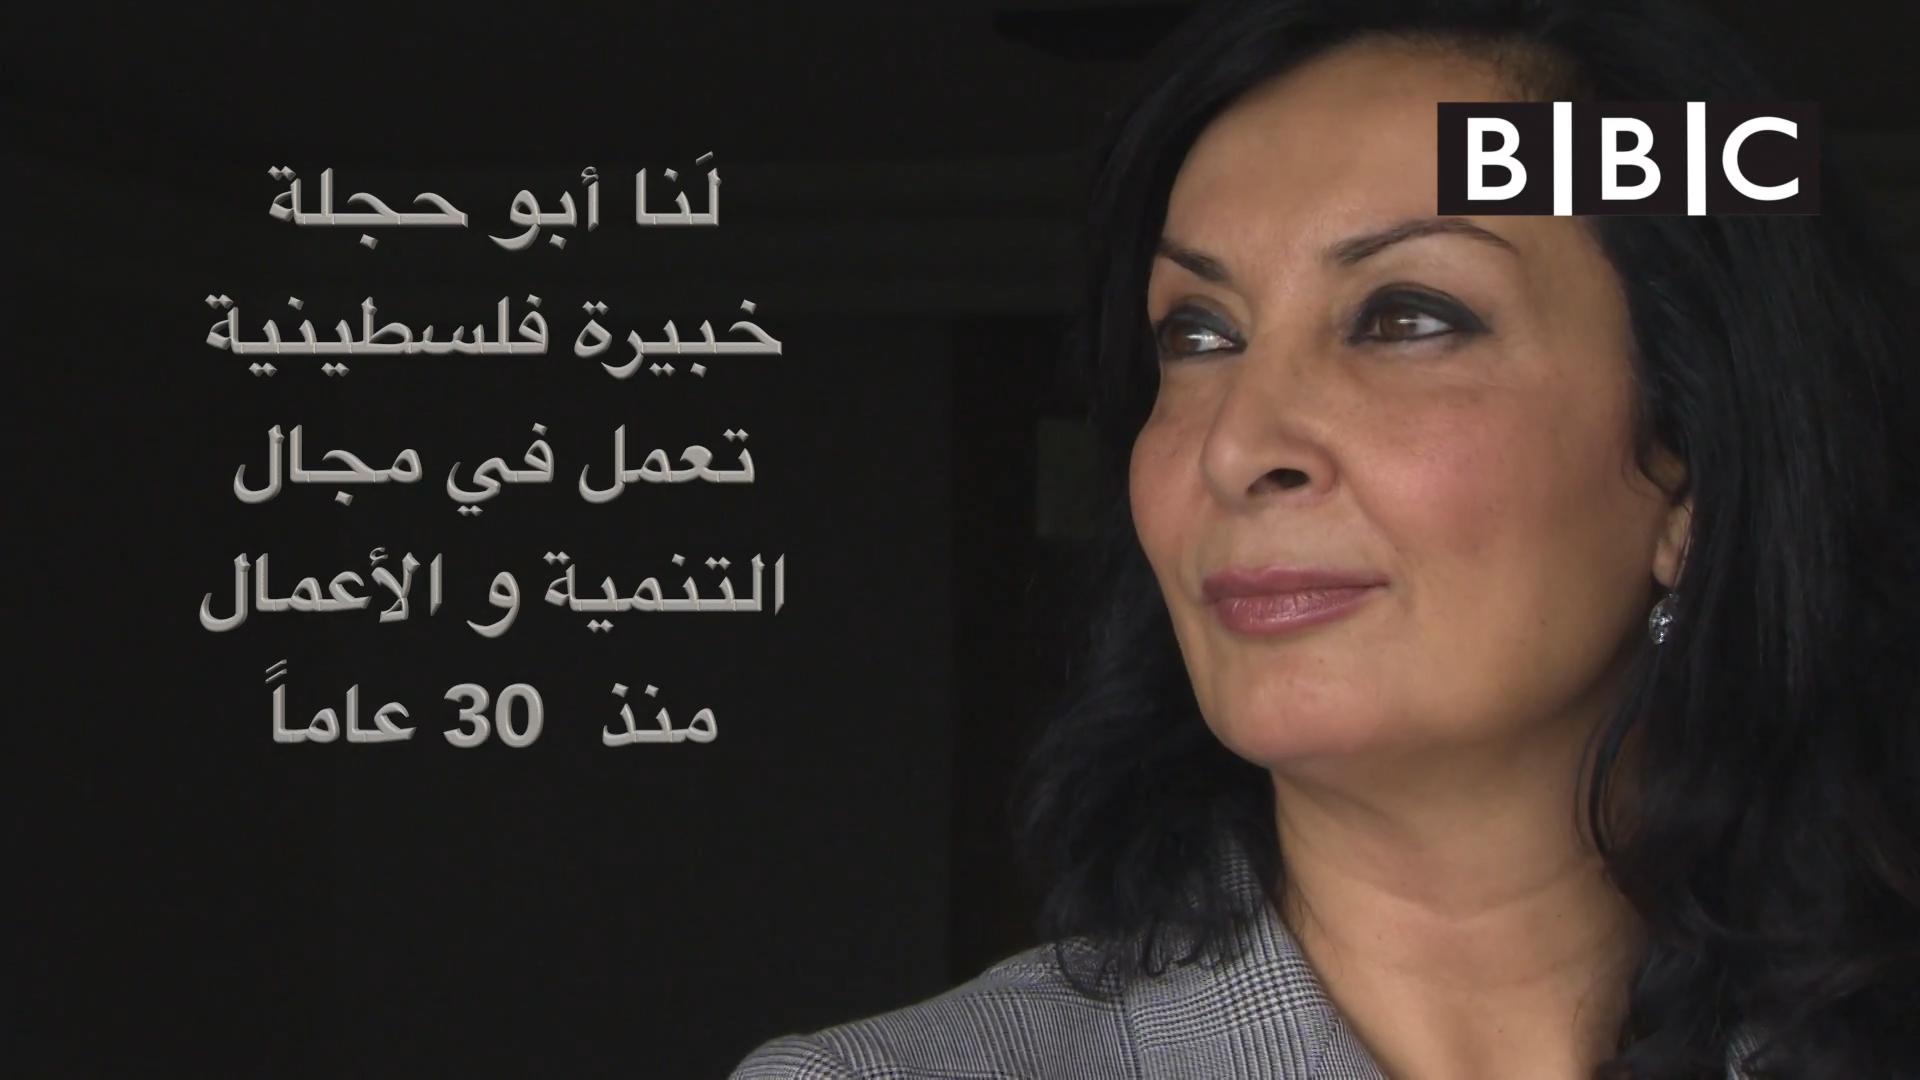 Lana Abu Hijleh Among the Top 100 Inspiring Women in the World of the Year 2015